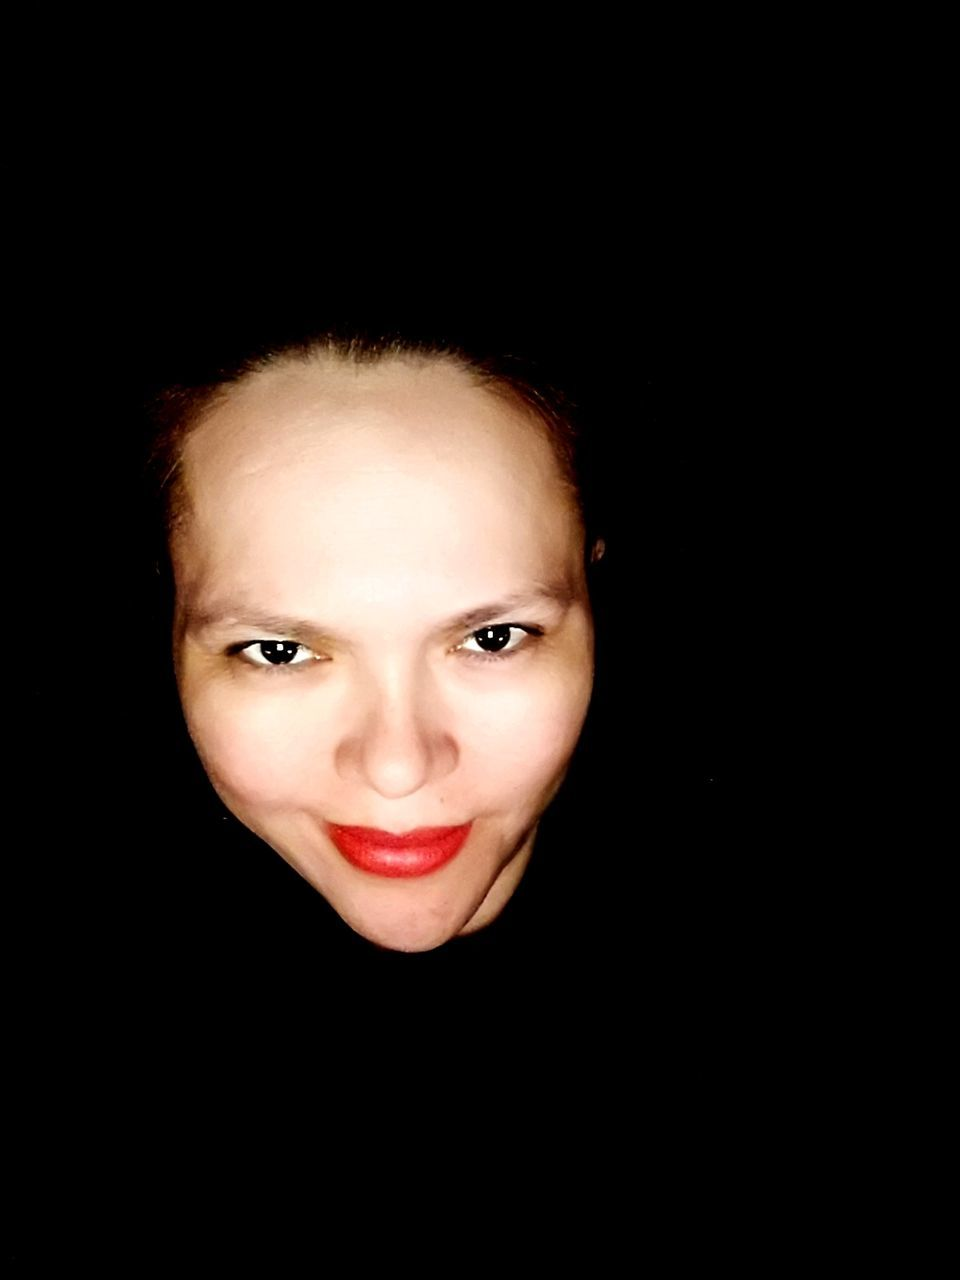 Close-Up Portrait Of Woman Smiling Against Black Background